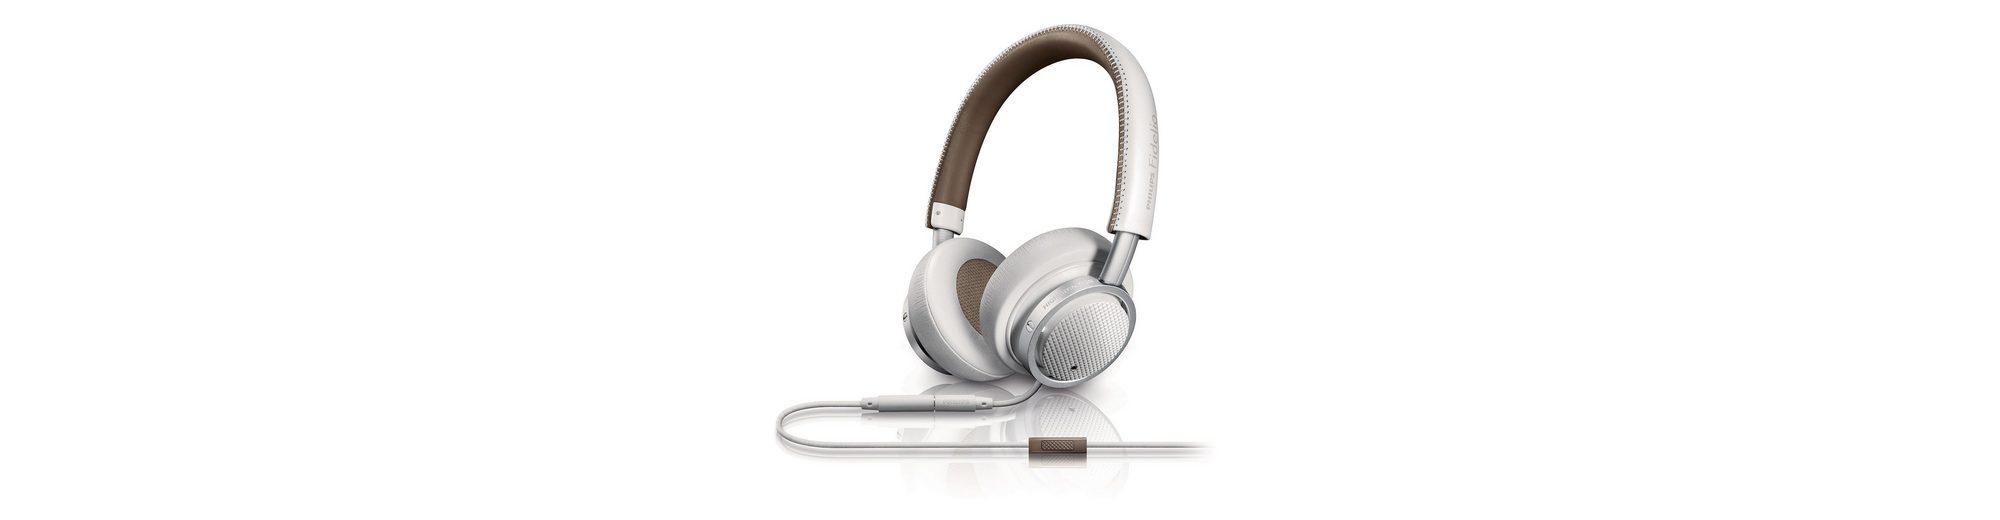 Philips Fidelio Bluetooth Headset »M1/00 weiss«